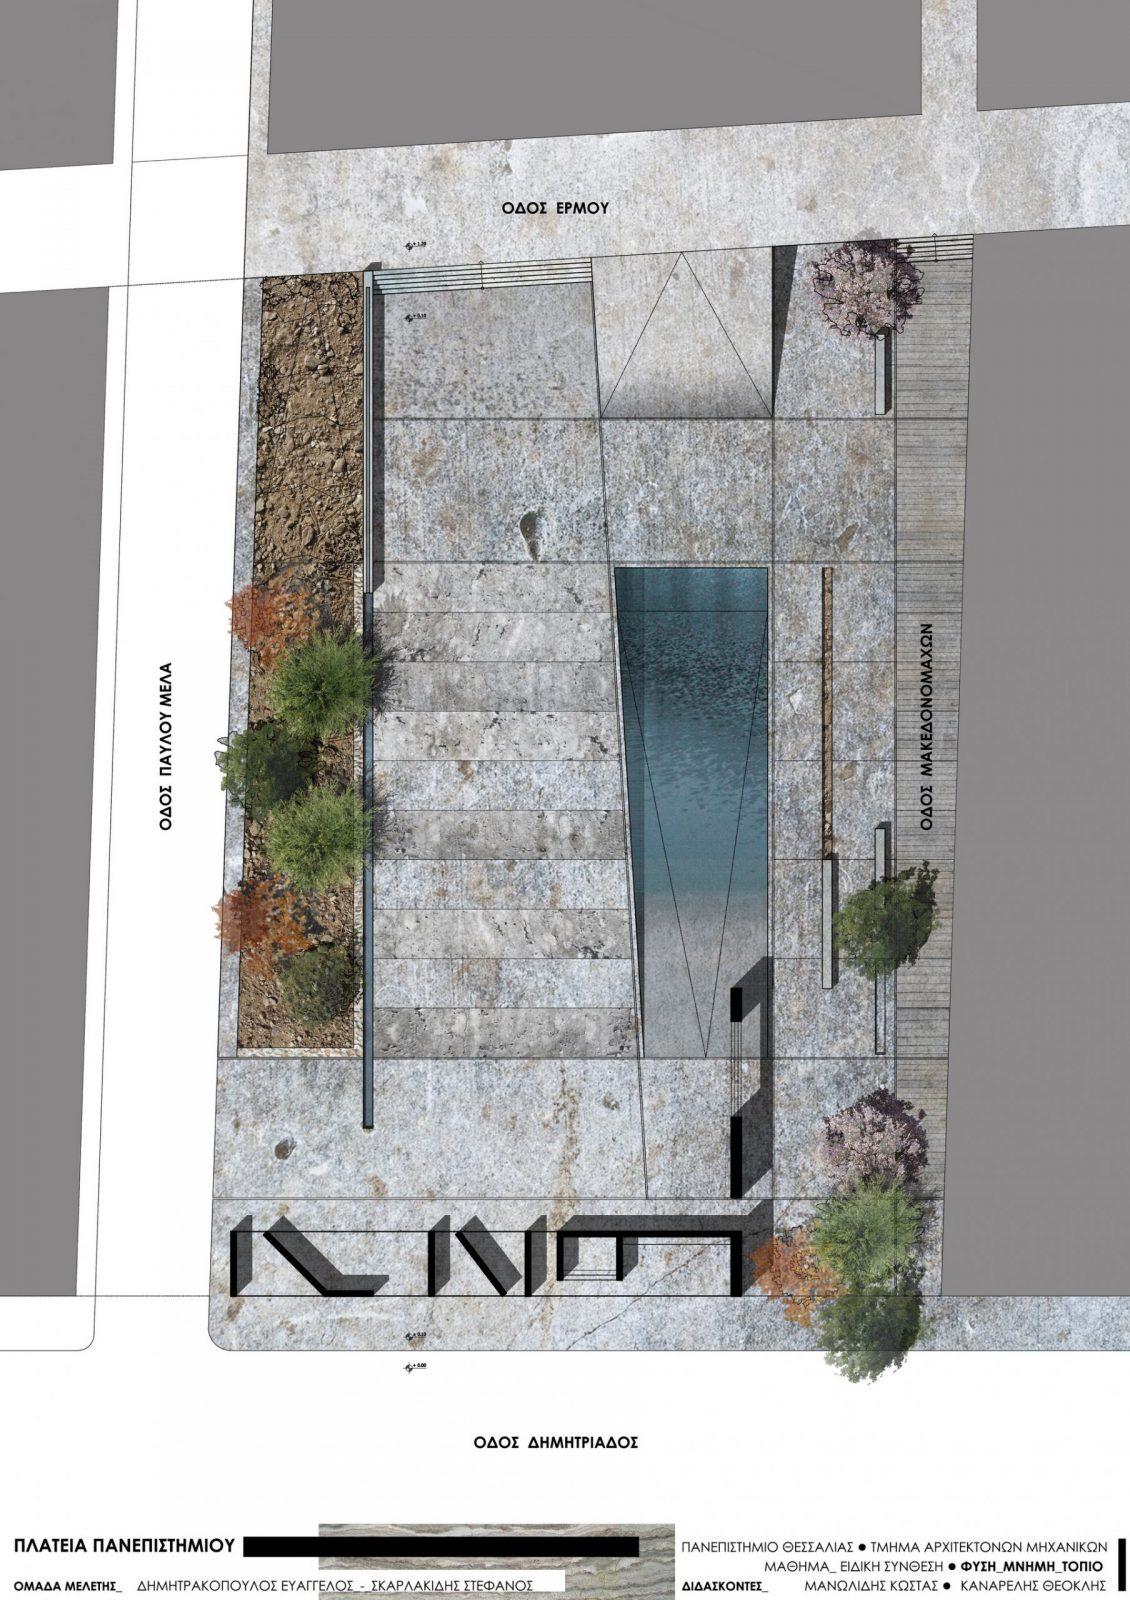 Panepistimiou Square - 4